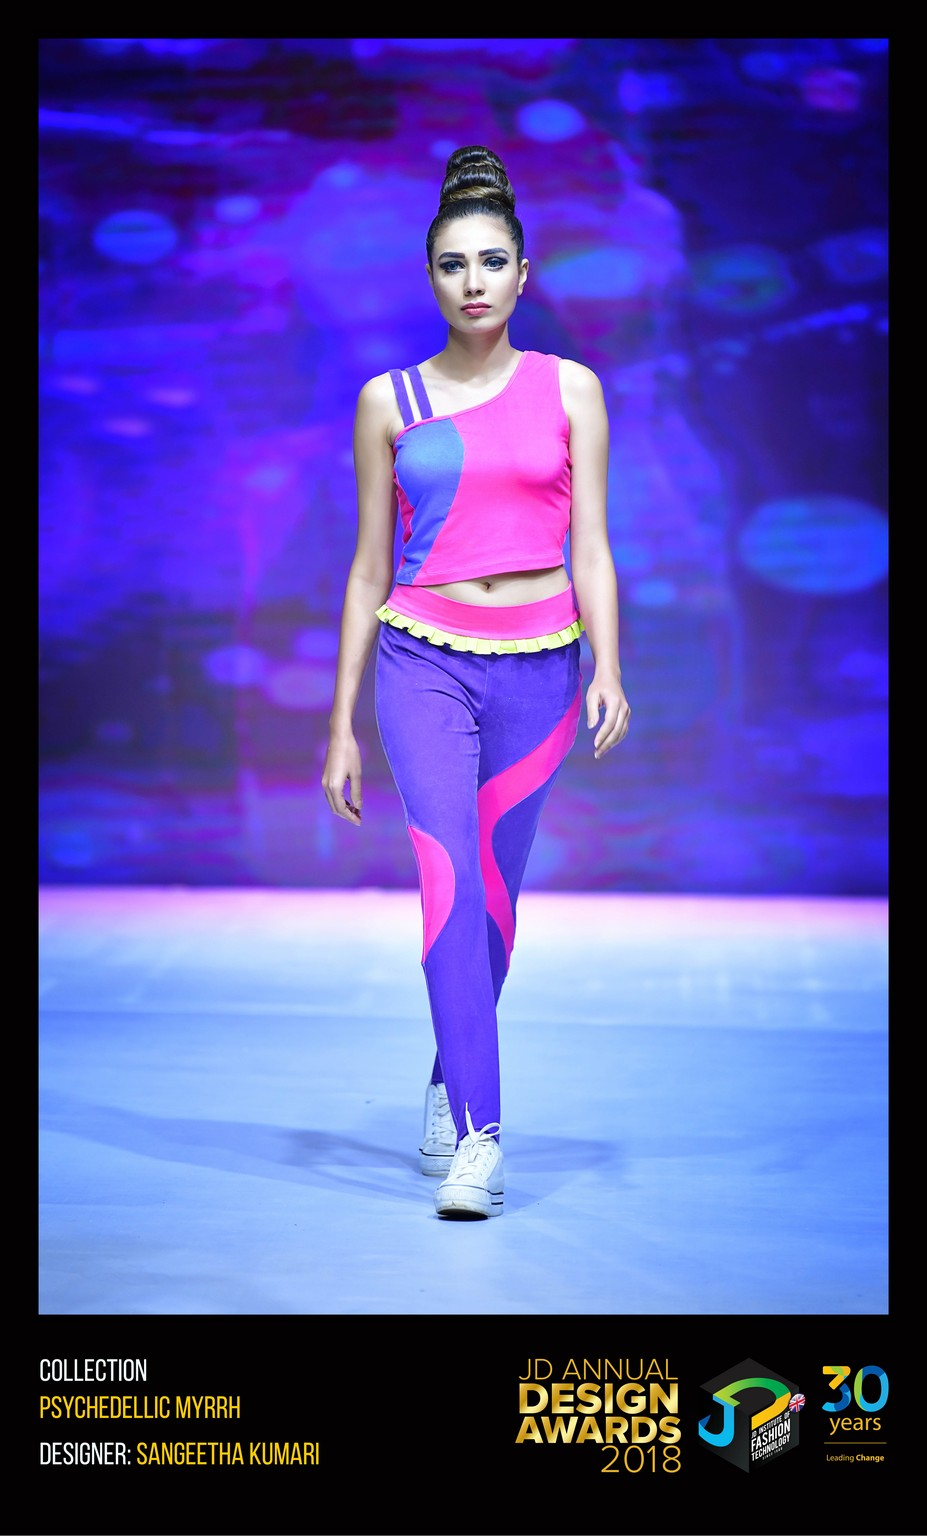 Psychedelic Myrrh – Change – JD Annual Design Awards 2018 | Designer: Sangeetha Kumari | Photography : Jerin Nath (@jerin_nath) psychedelic myrrh - PSYCHEDELLIC MYRRH8 - Psychedelic Myrrh – Change – JD Annual Design Awards 2018